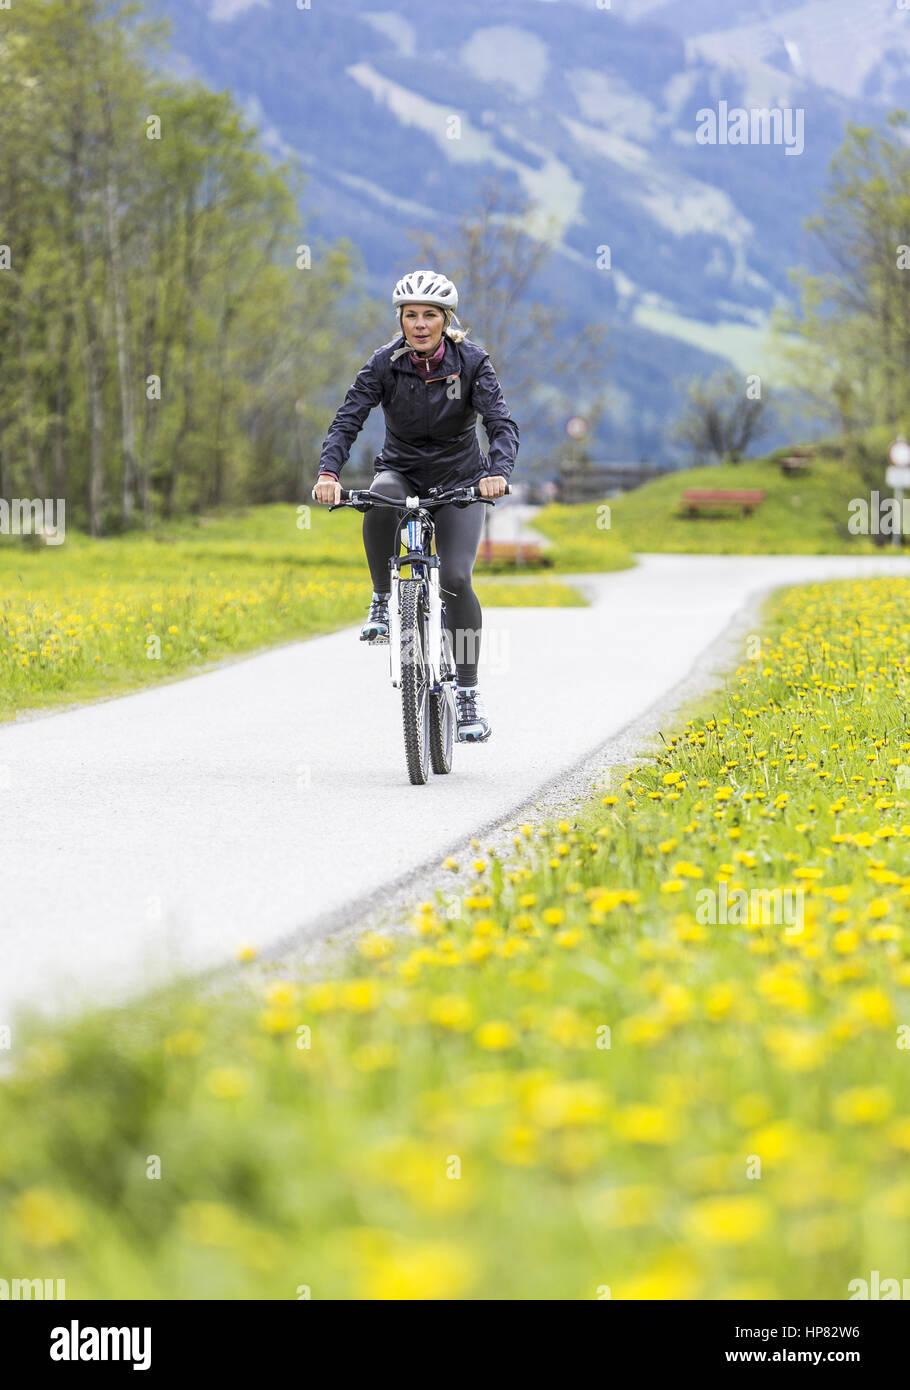 Frau beim Fahrrad fahren (model-released) - Stock Image